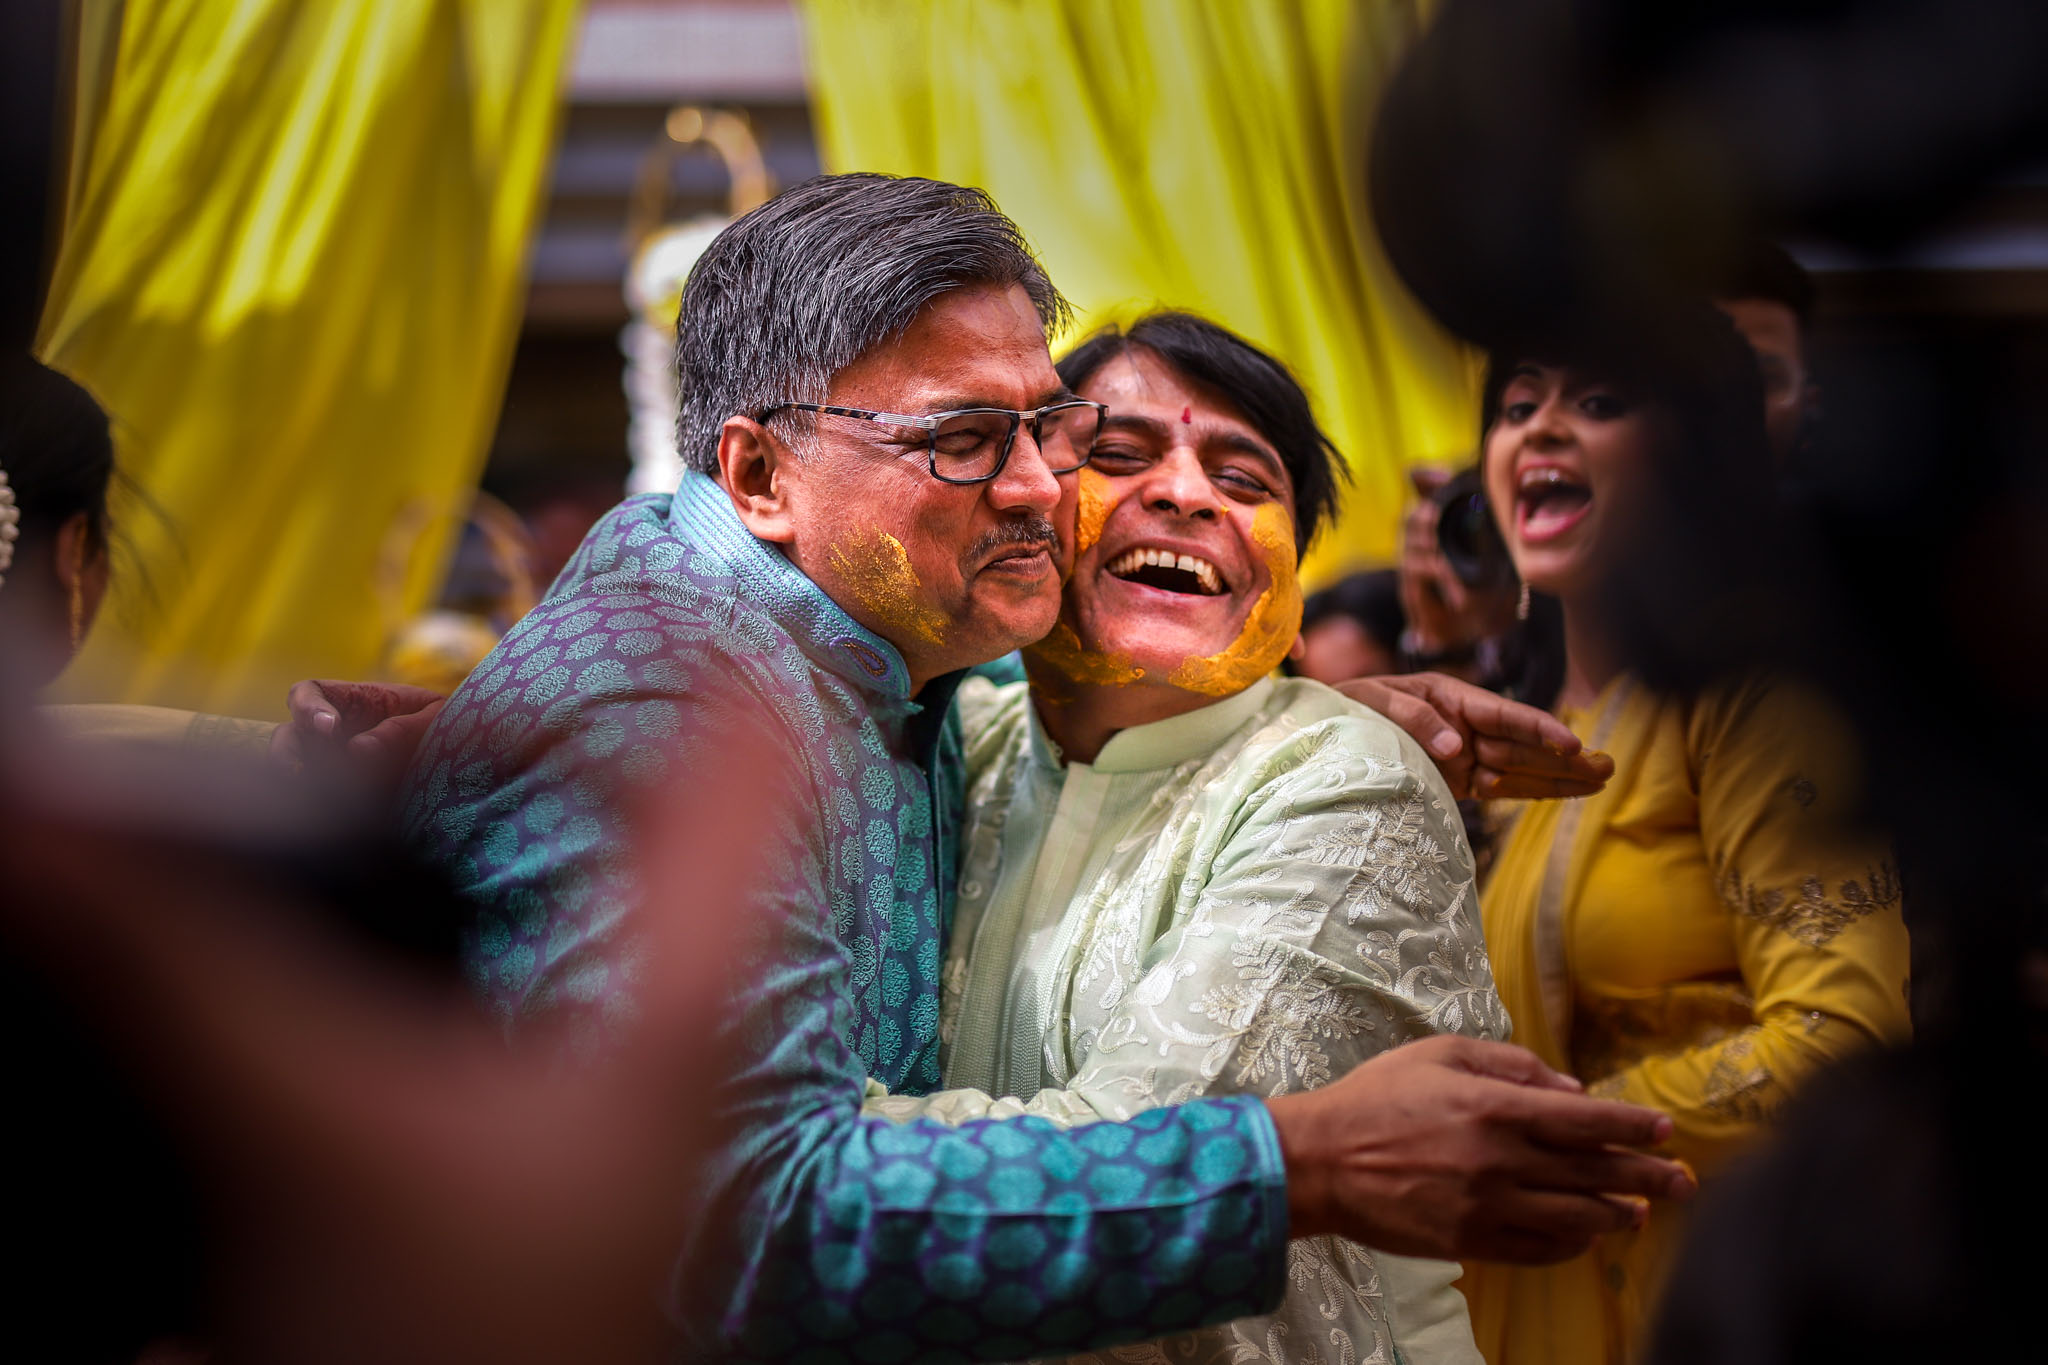 Mukti x Ojas Wedding Akshjay Sansare Photography Best wedding photographer in mumbai India Candid Cinematic Films videos-10.jpg